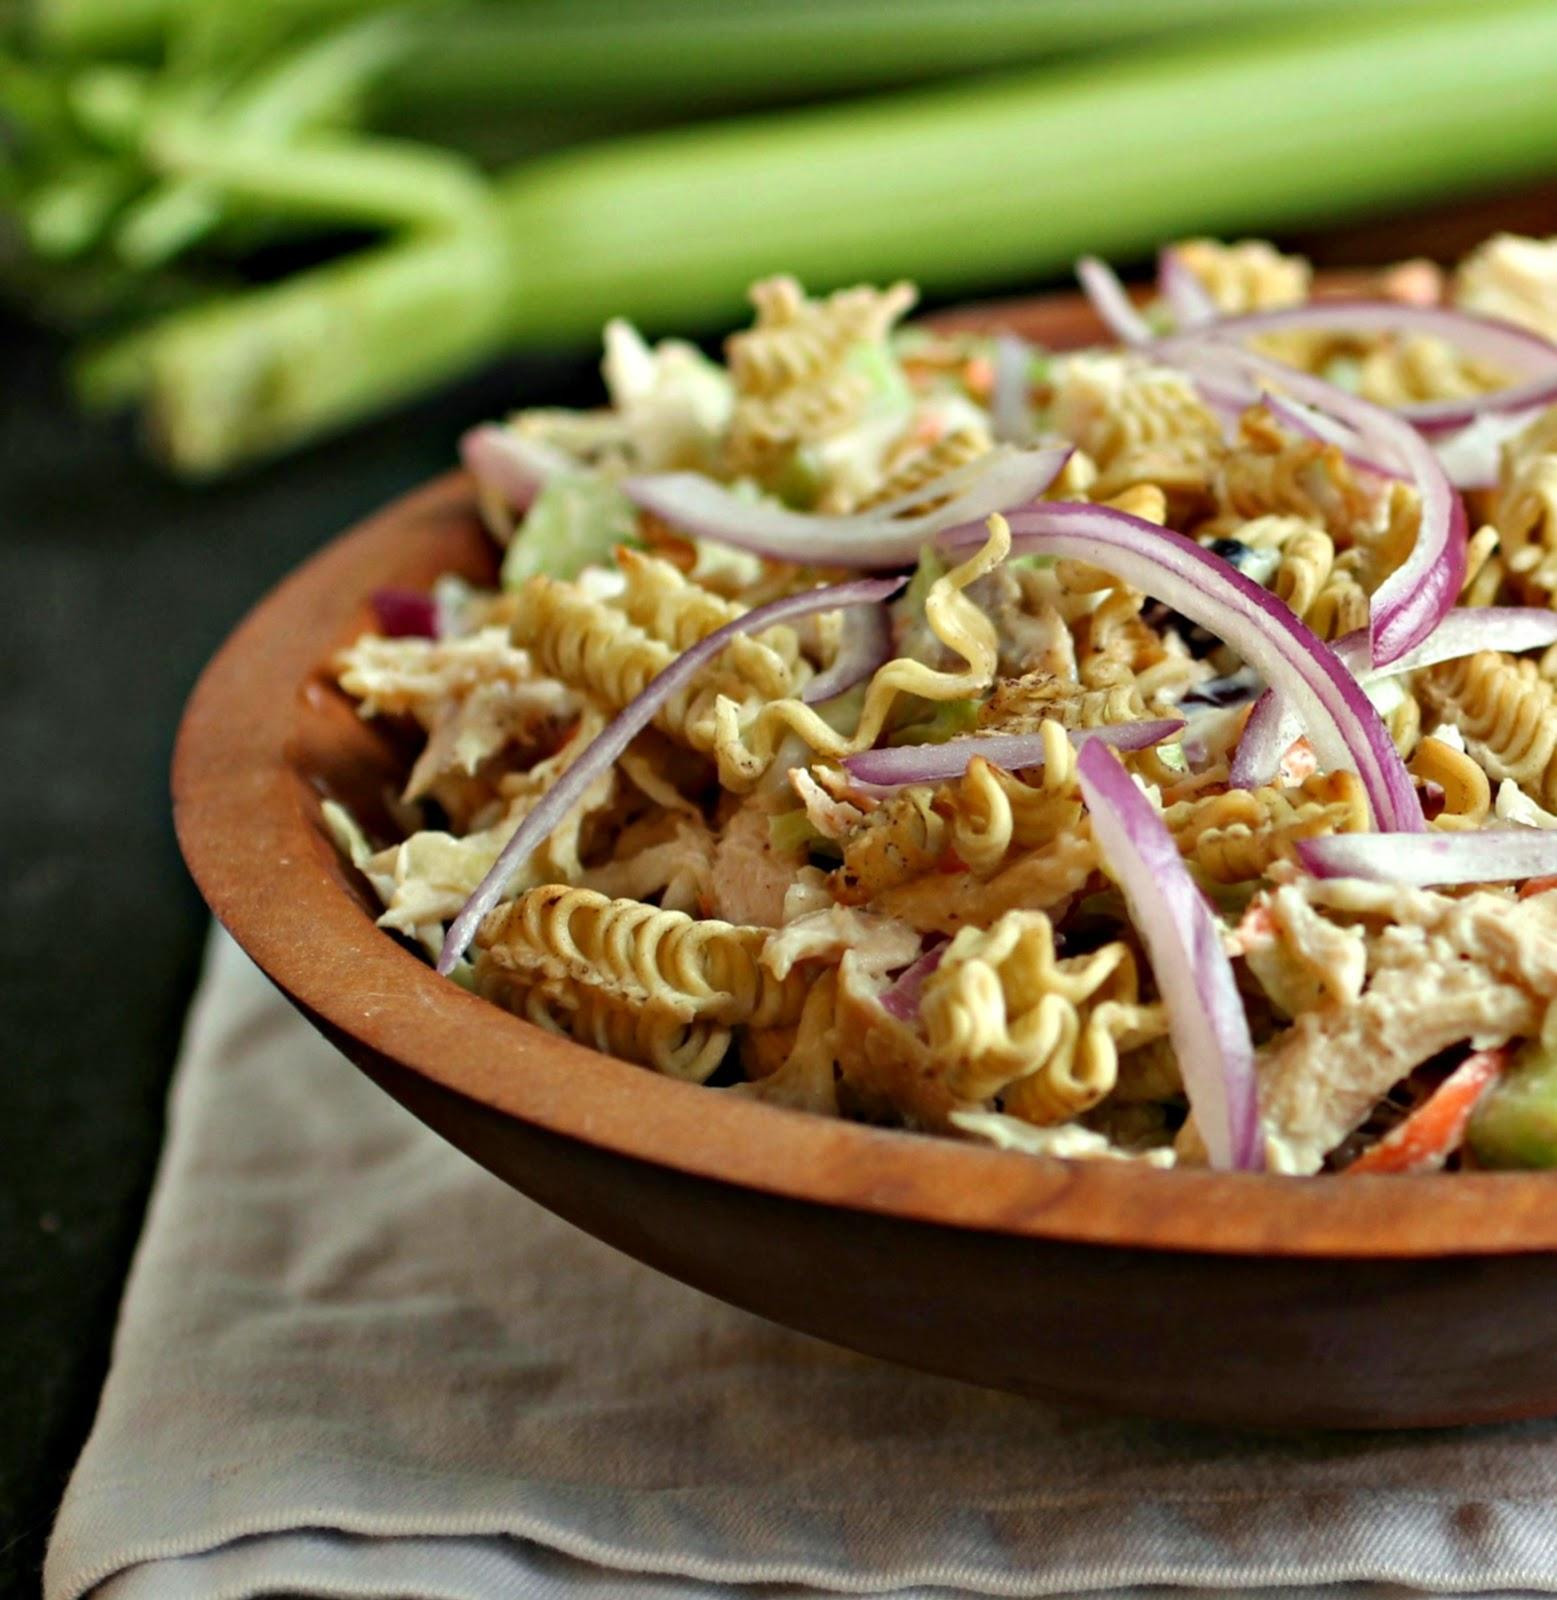 Crunchy Loaded Chicken Salad